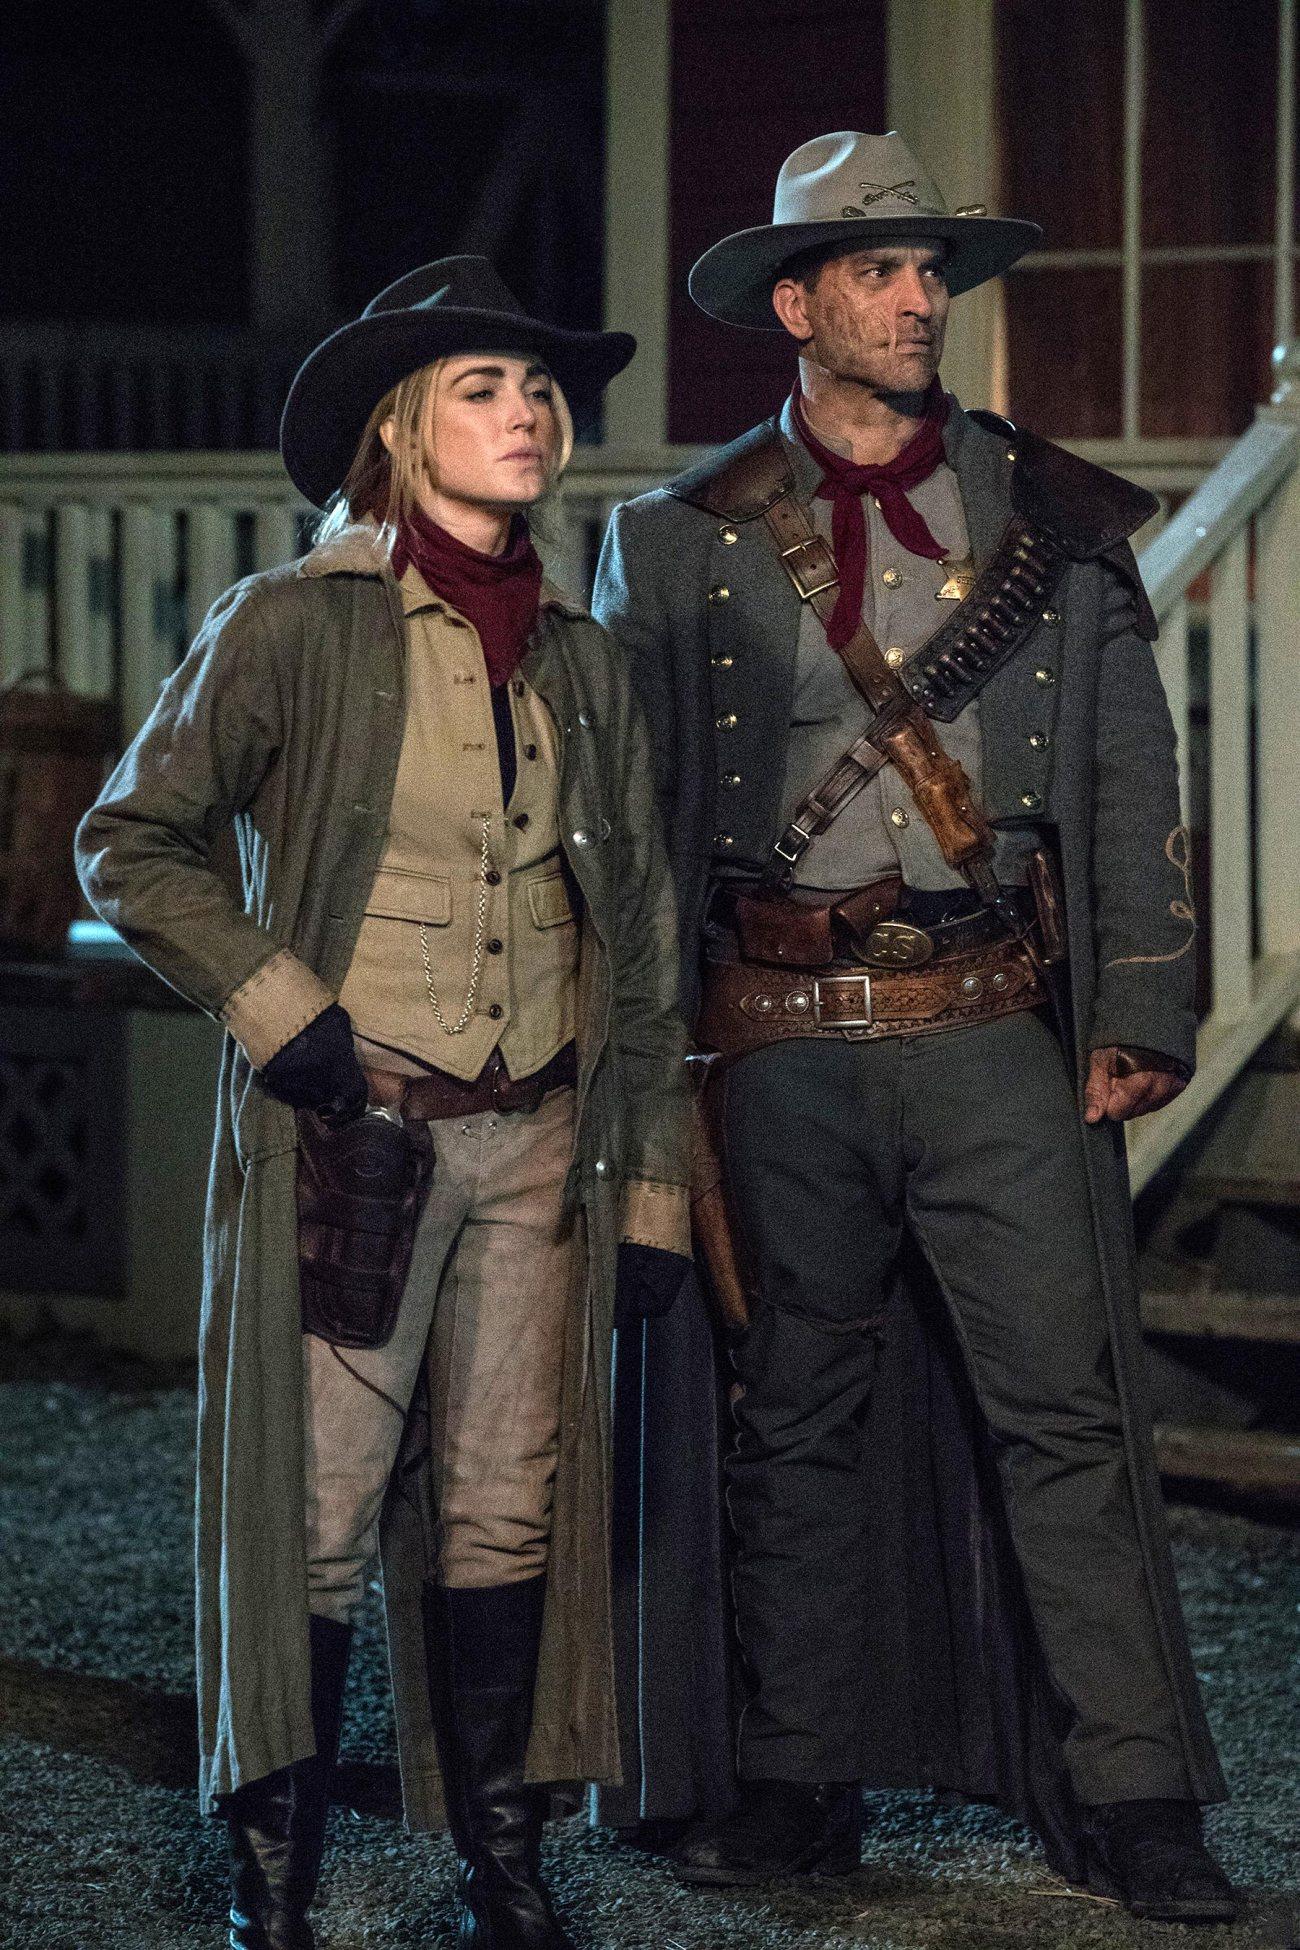 Caity Lotz como Sara Lance/White Canary y Johnathon Schaech como Jonah Hex en DC's Legends of Tomorrow. Imagen: Jack Rowand/The CW